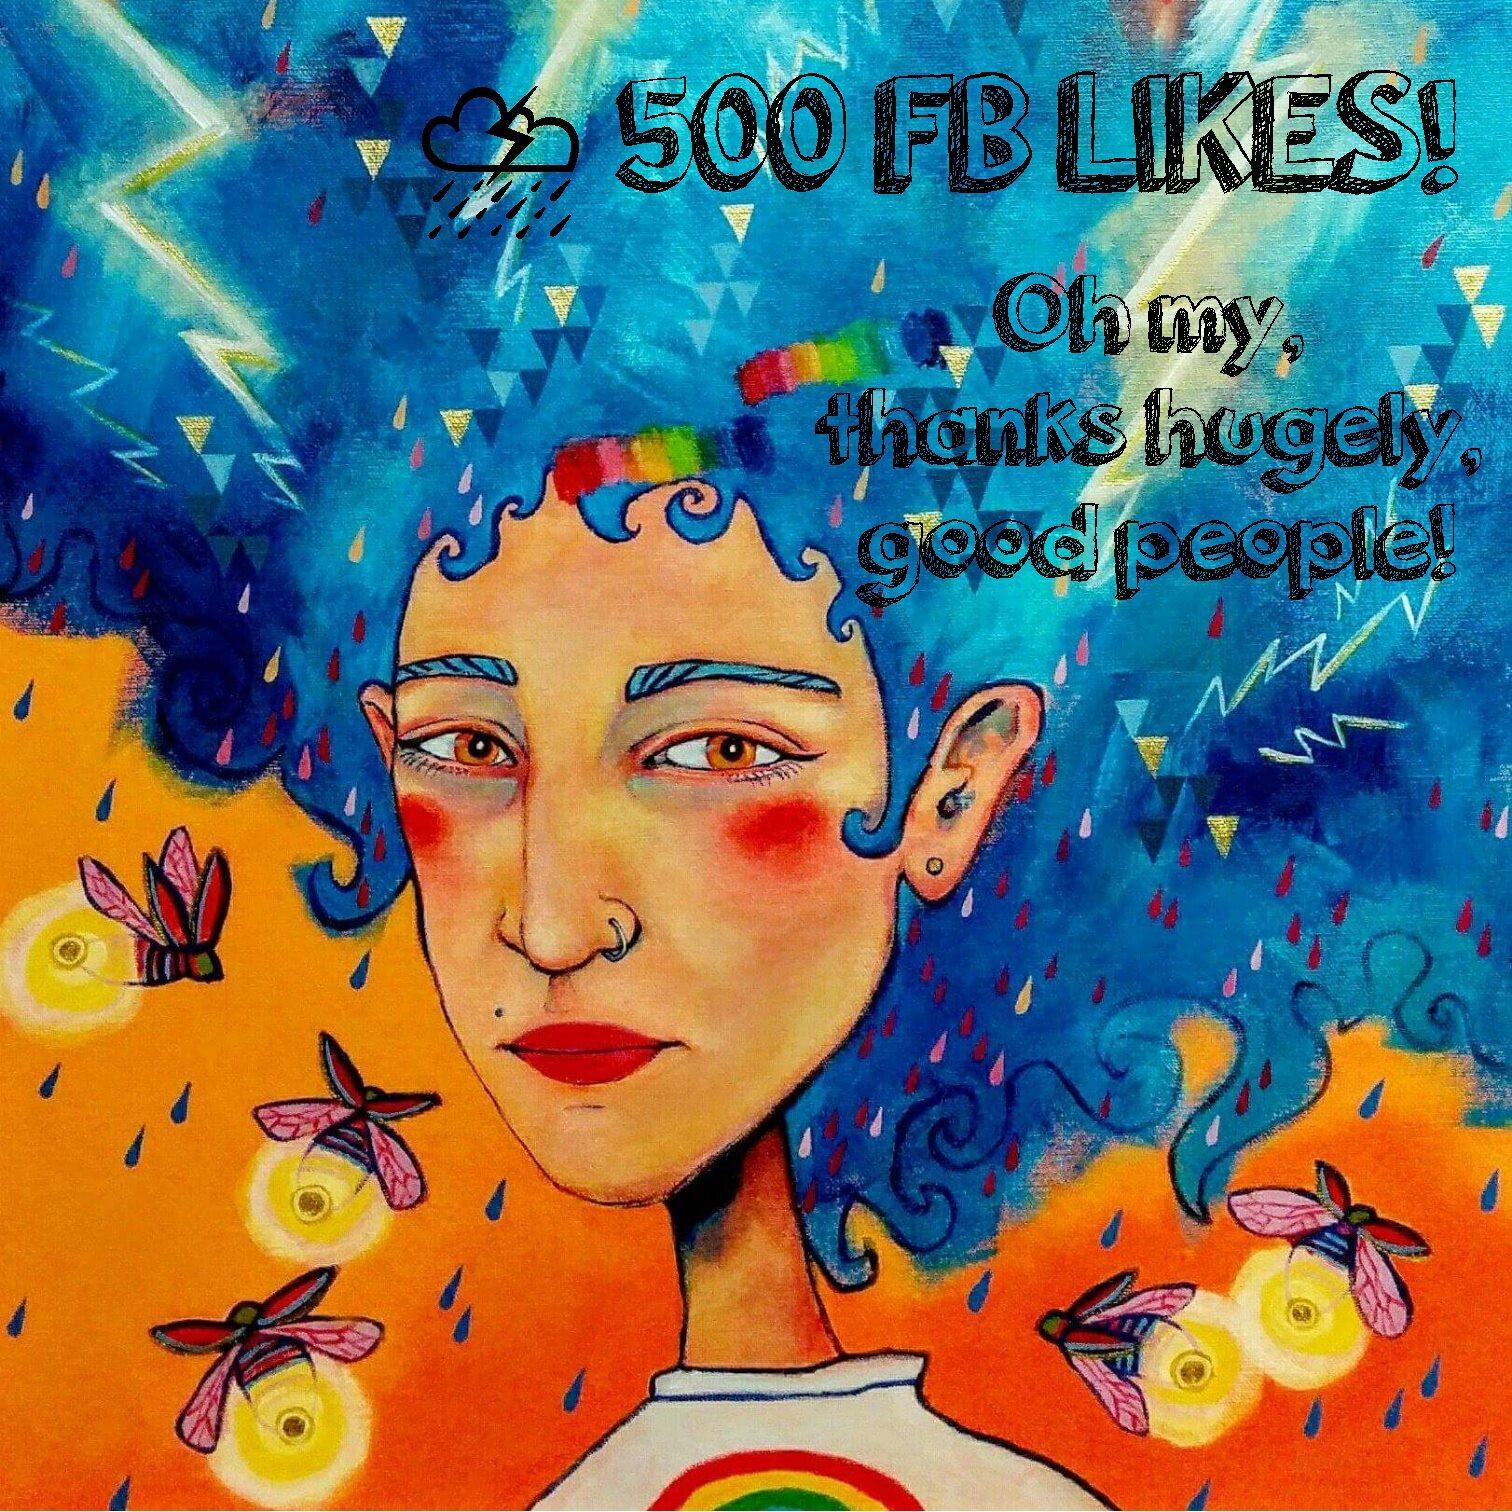 500 FB LIKES!